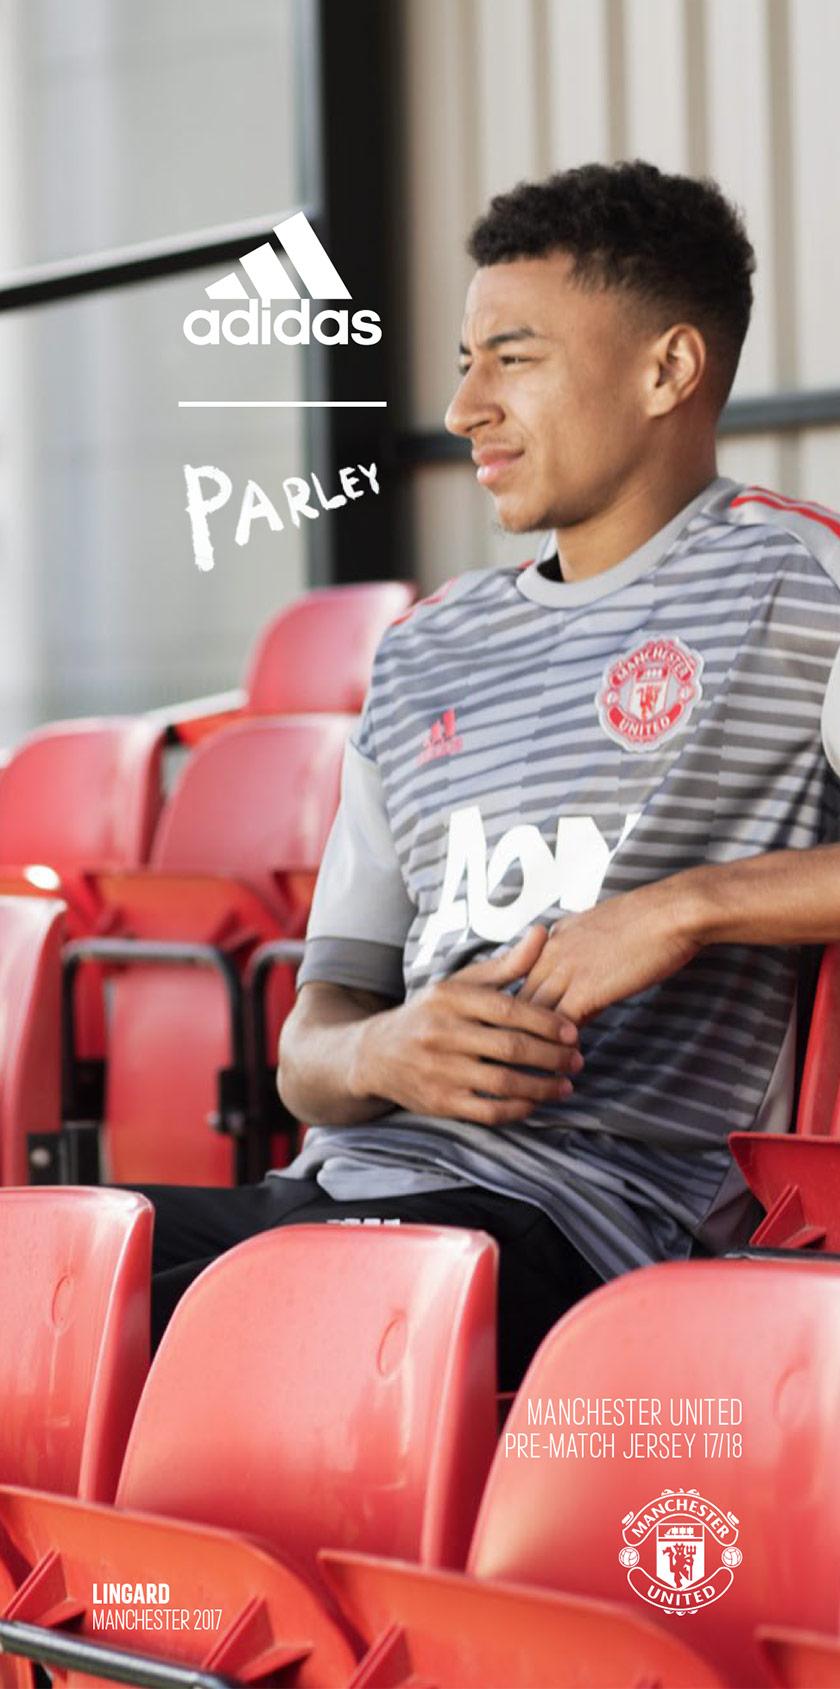 Adidas Parley Lingard